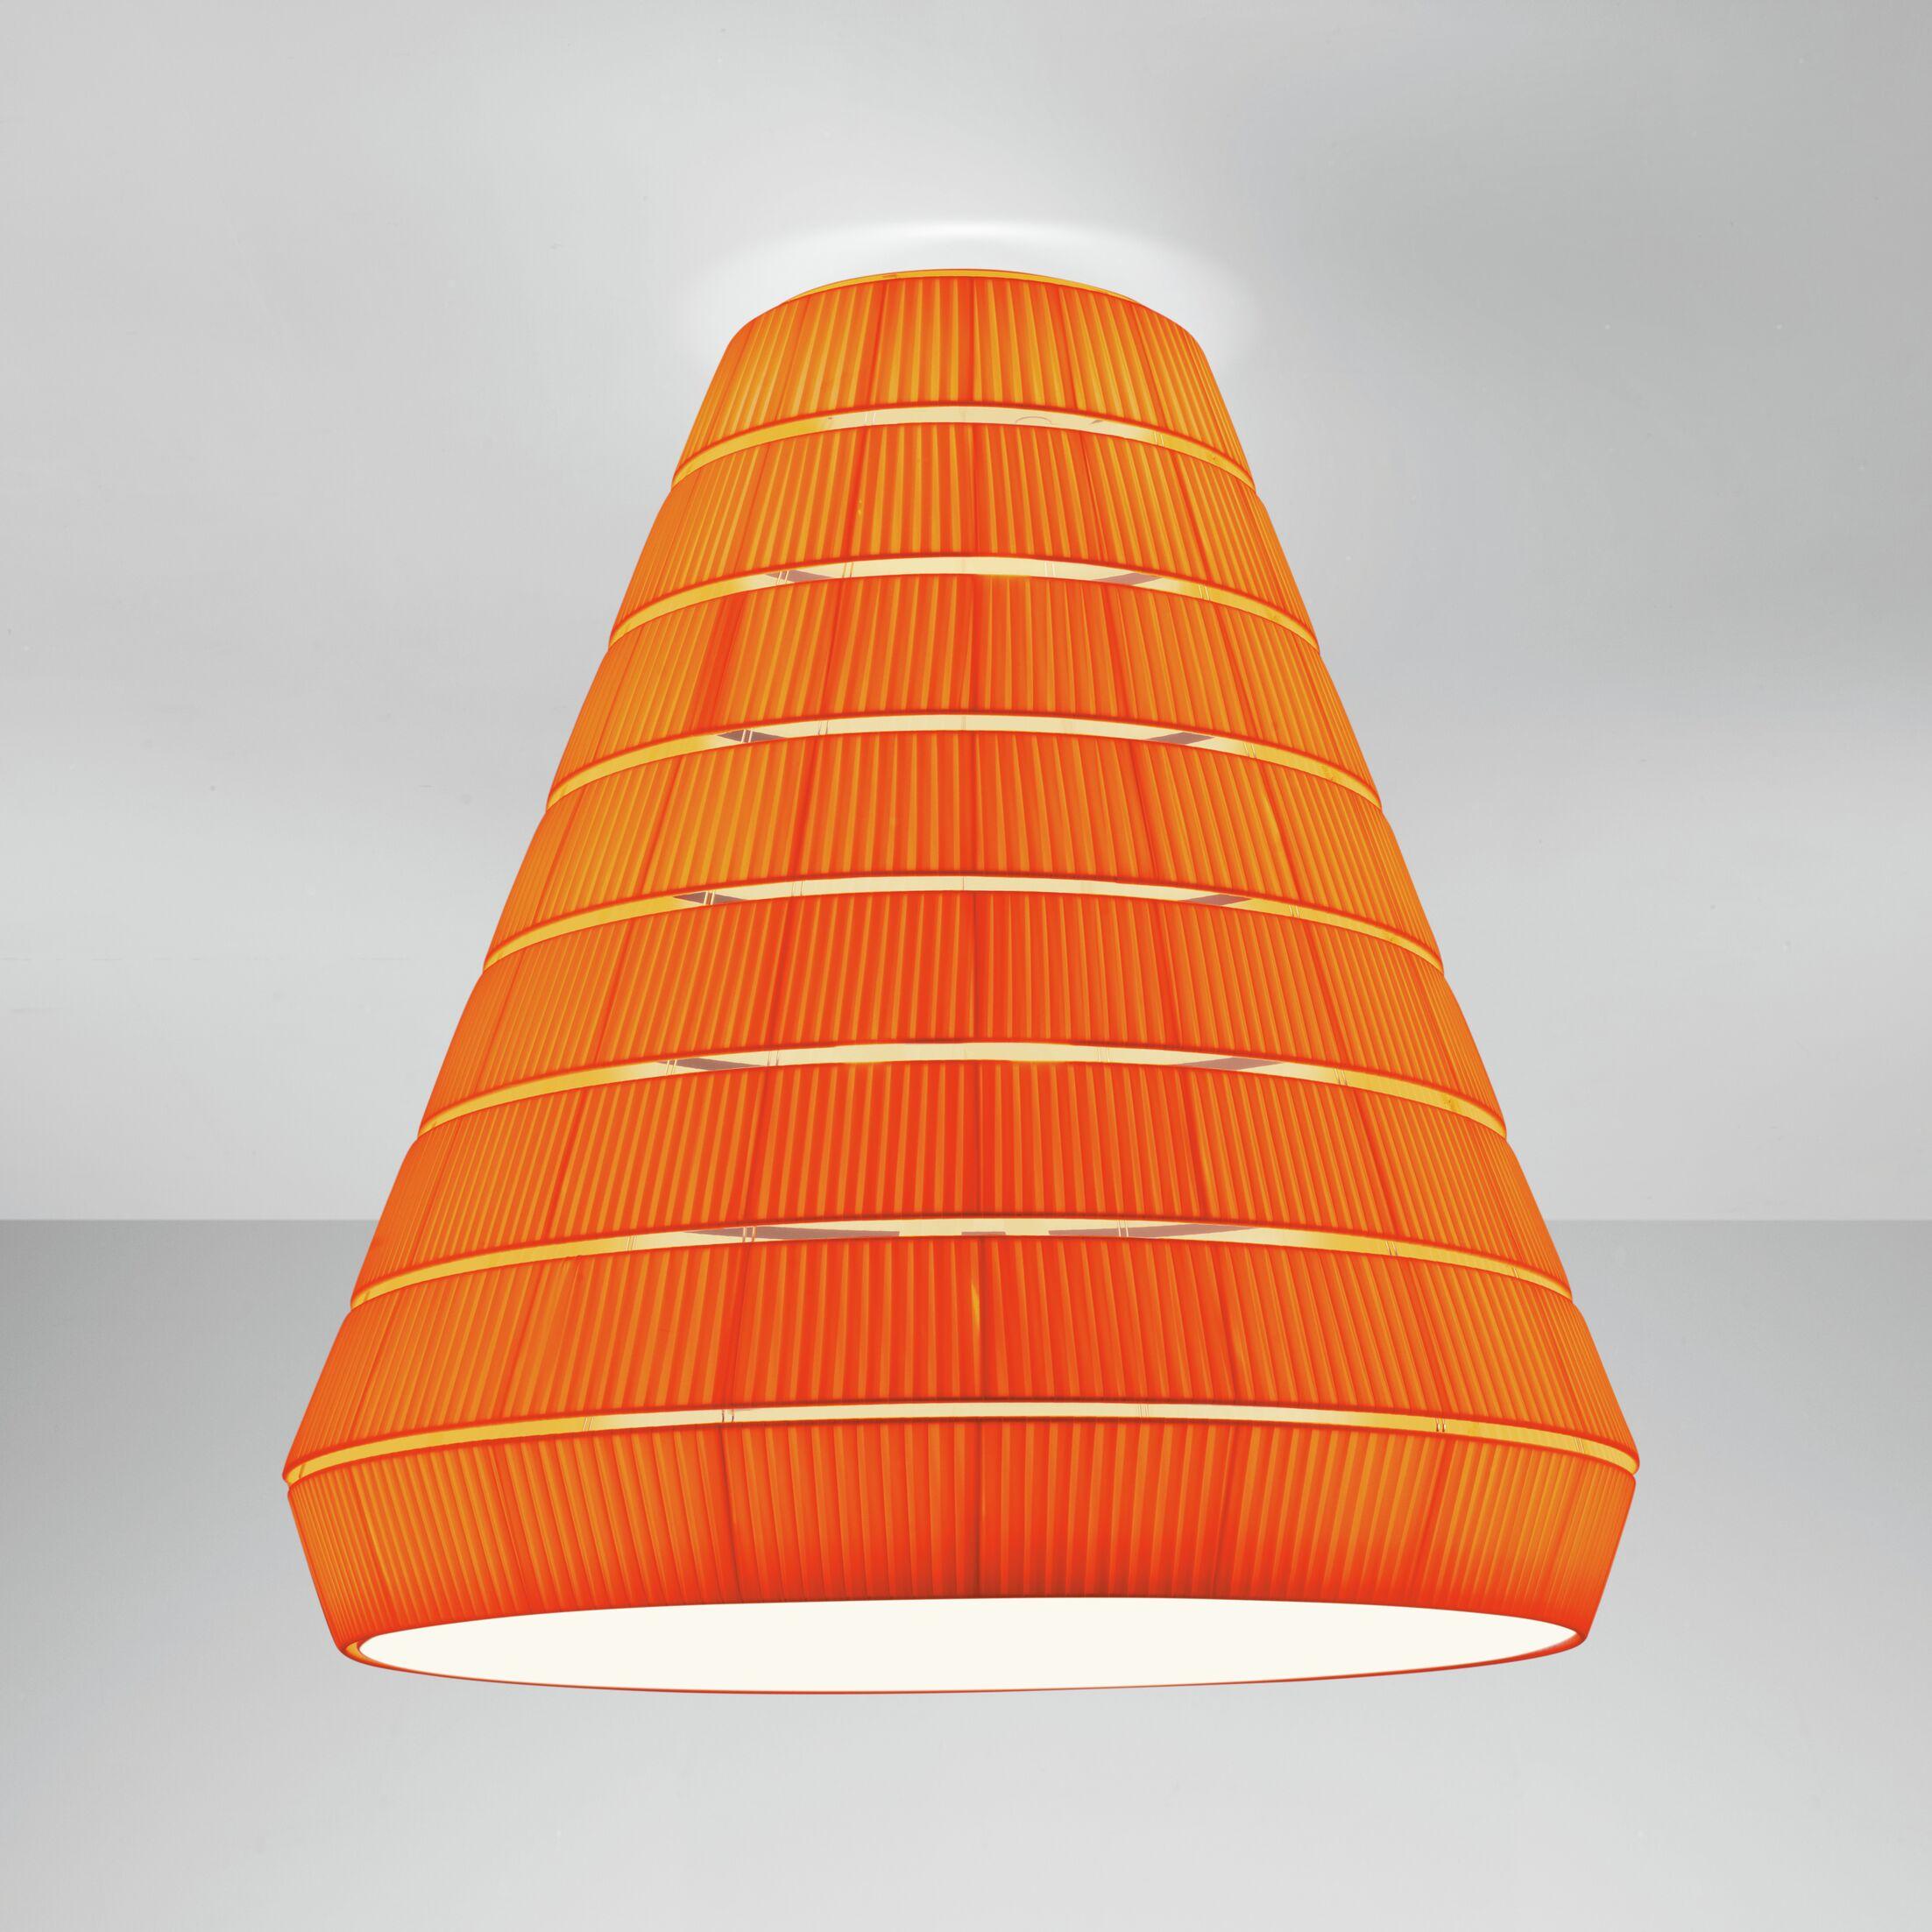 Layers E 9-Light Flush Mount Shade Color: Multicolour 1 (RB / RS / AR / GI)